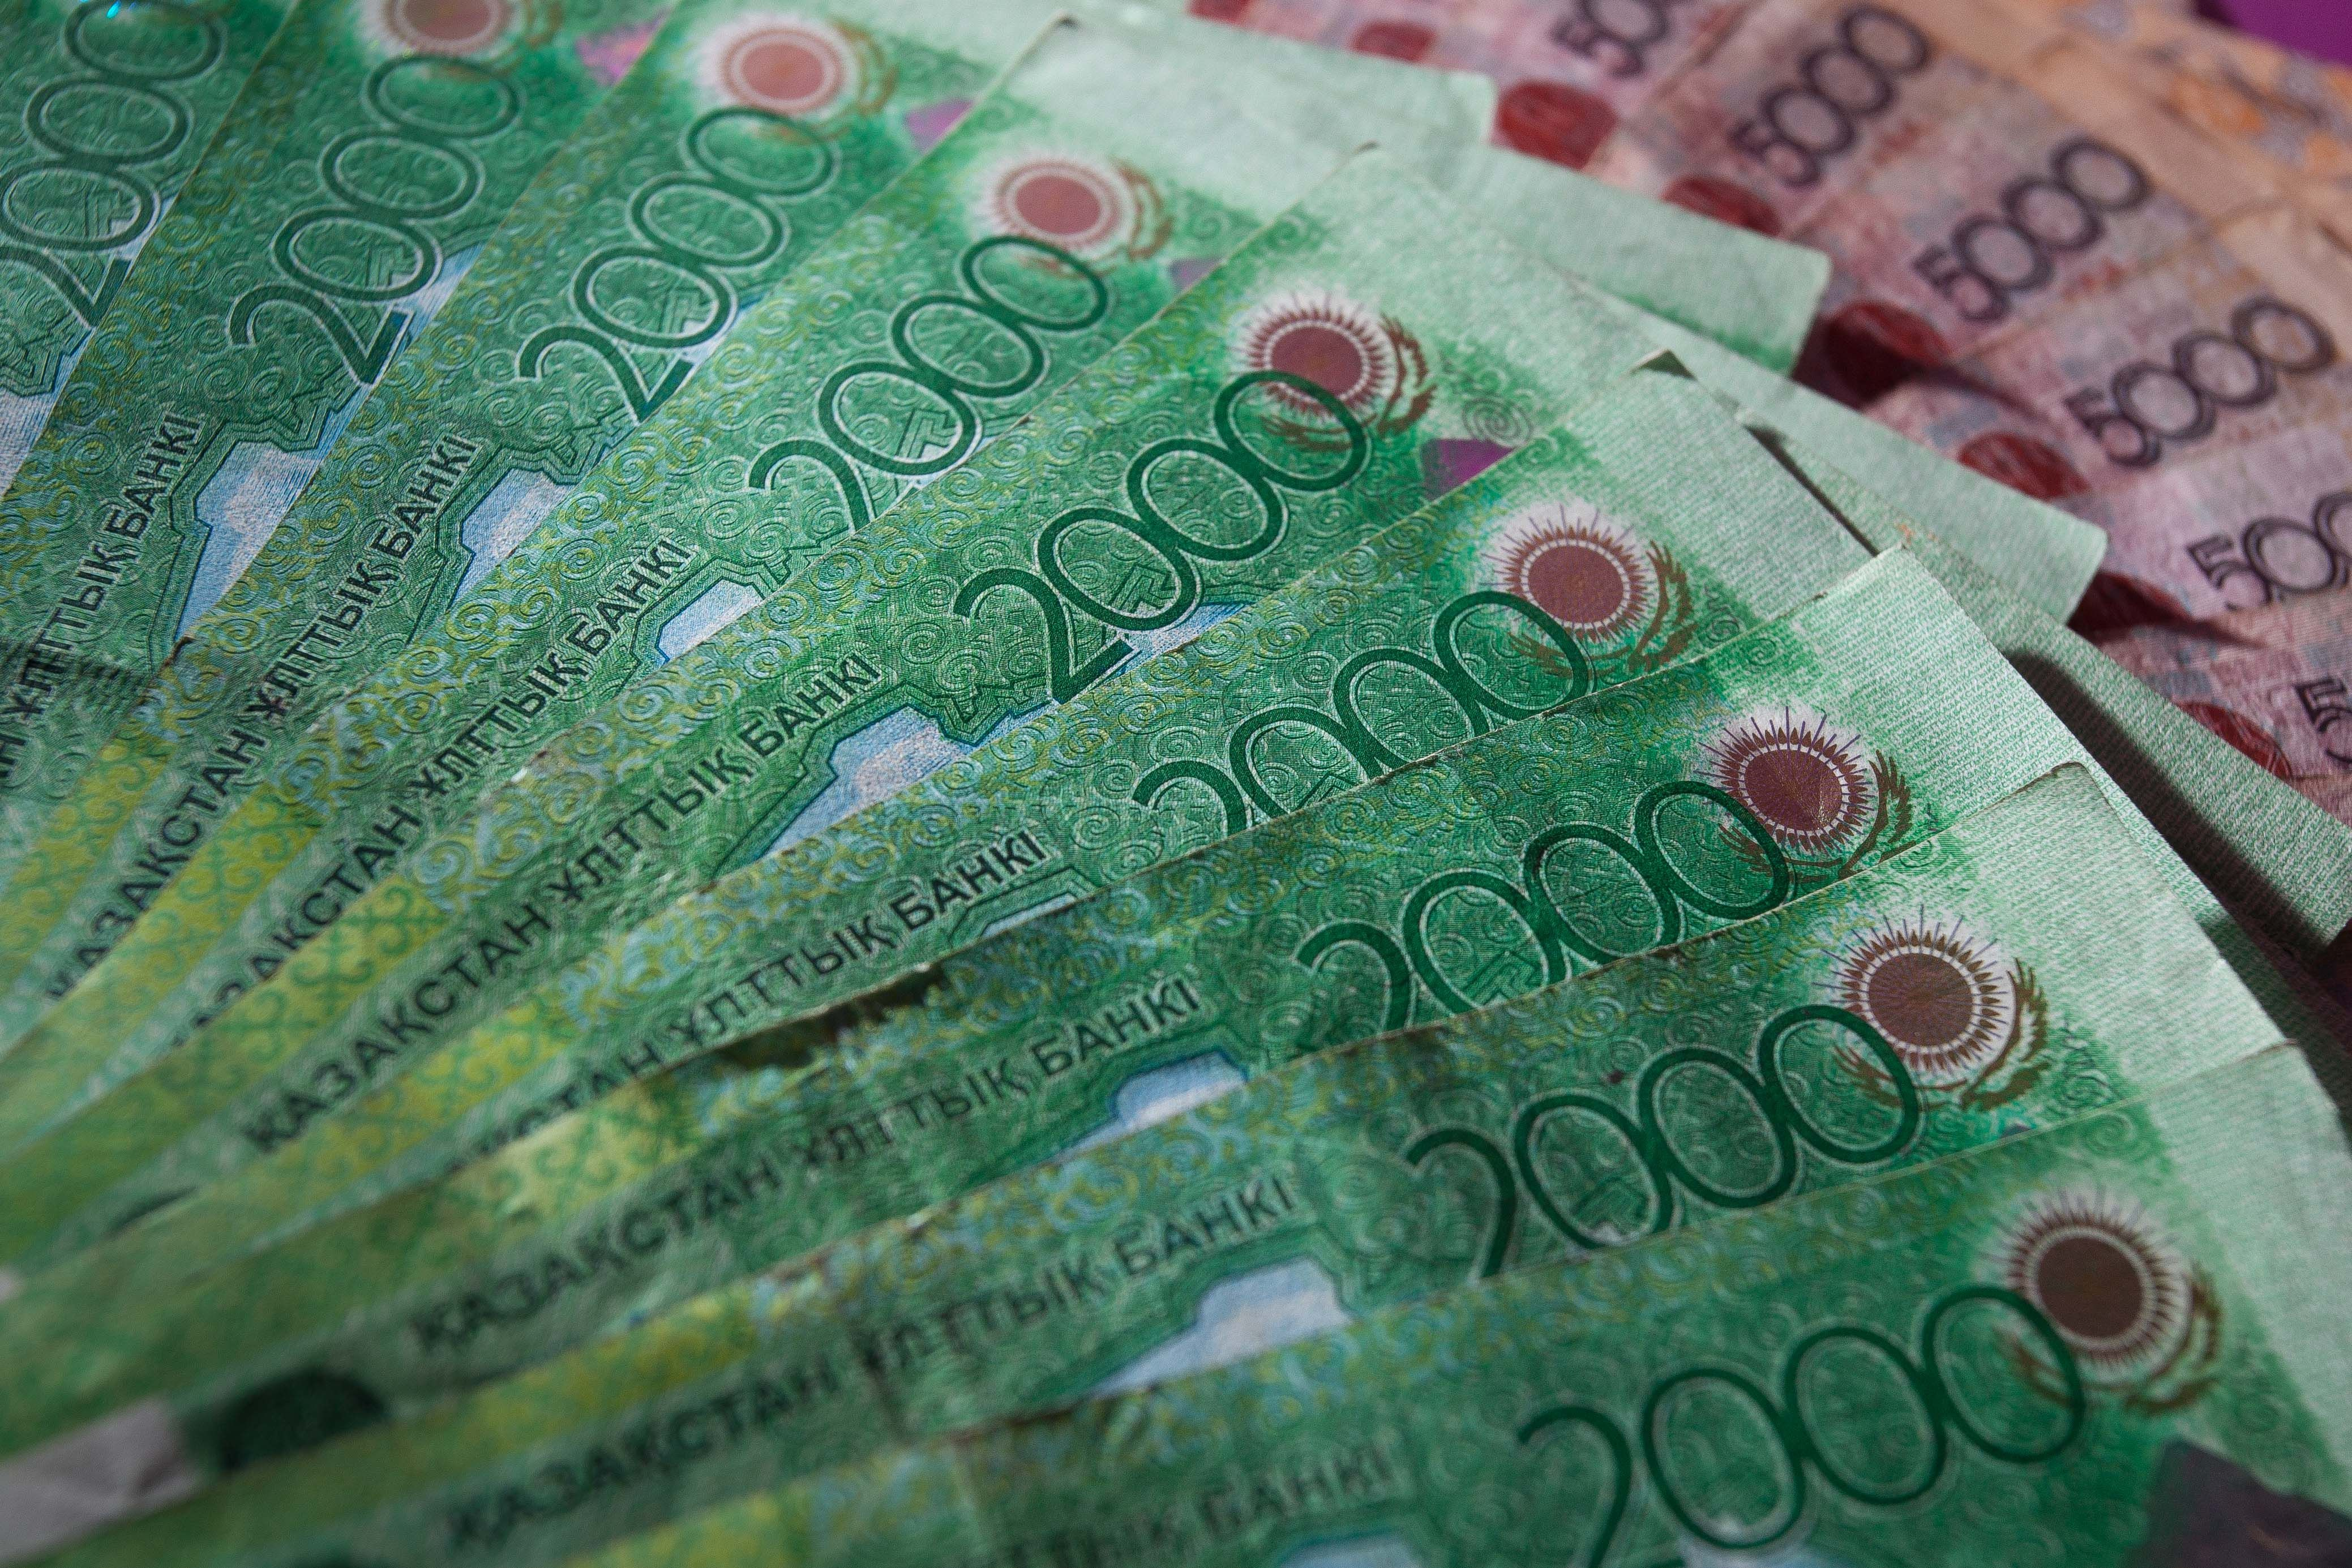 Финансы 55544 - Kapital.kz